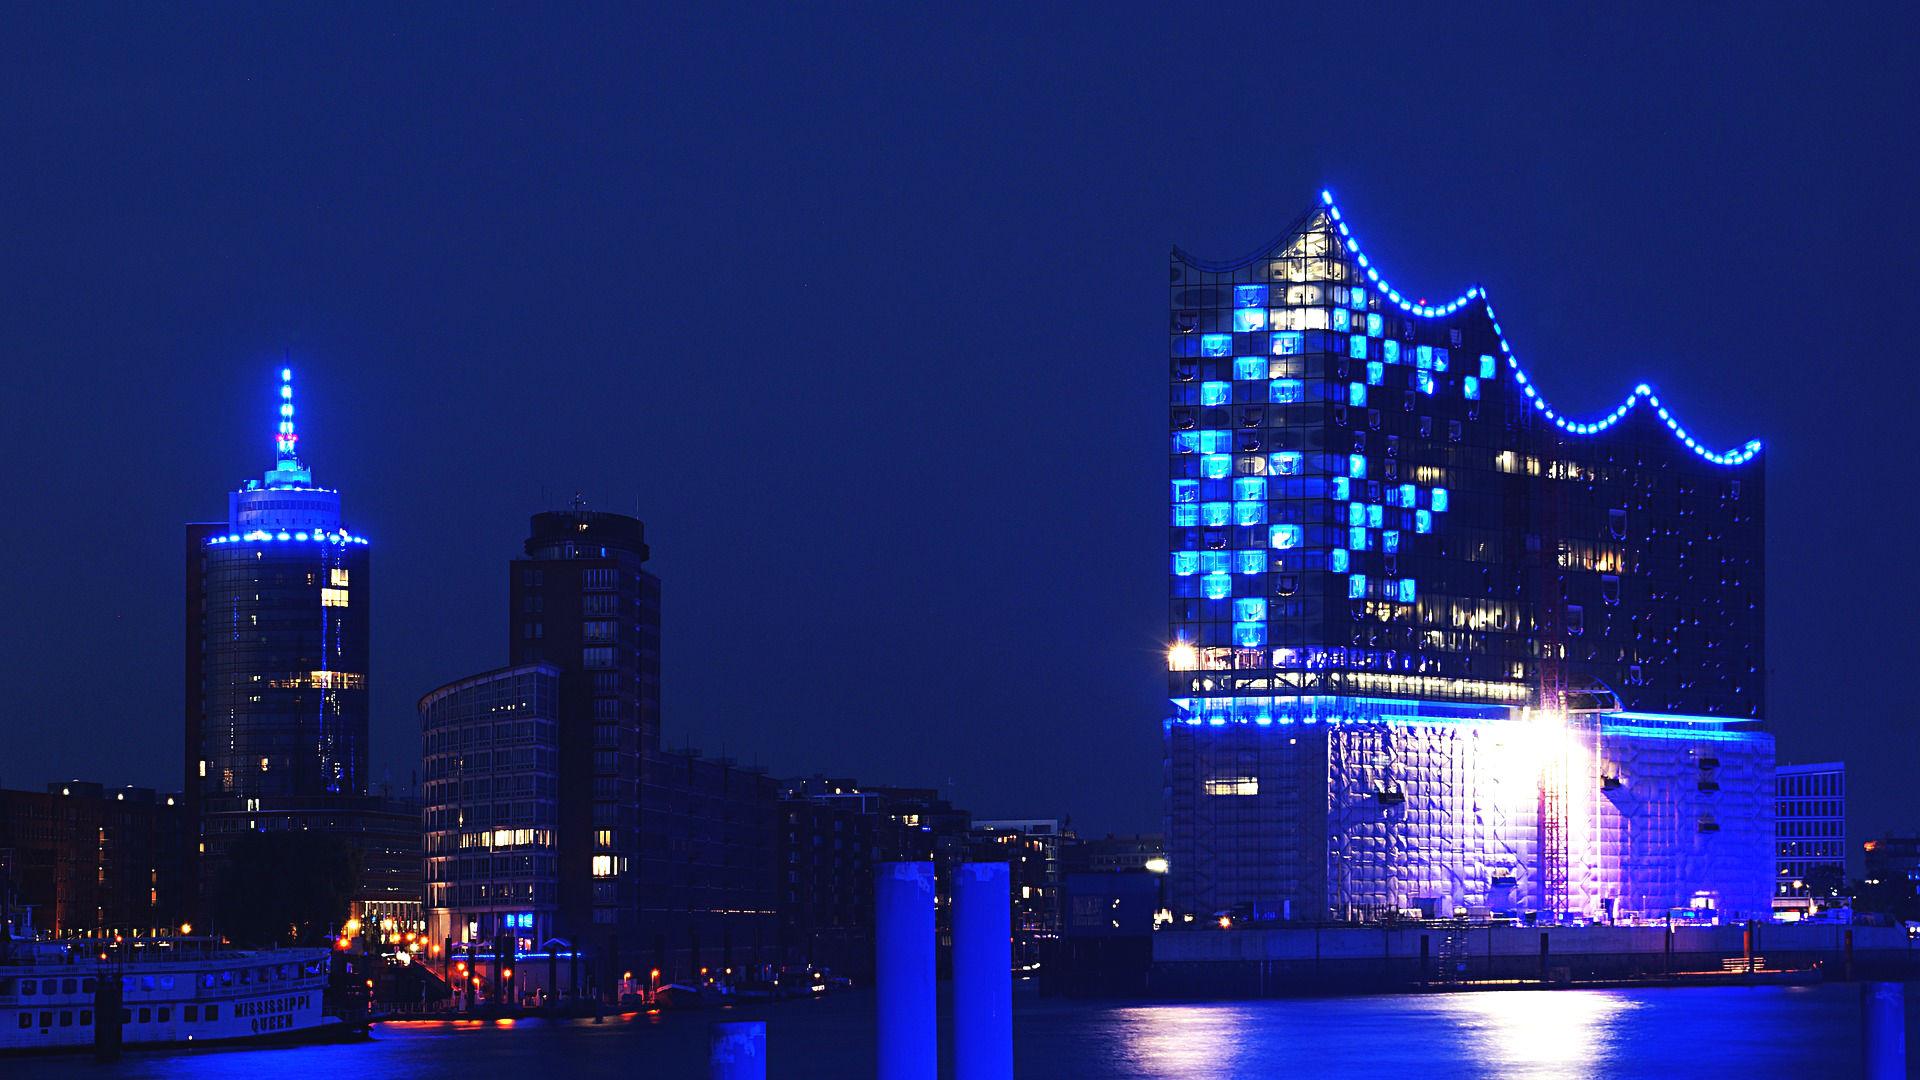 Hamburg's Elbphilharmonie at night